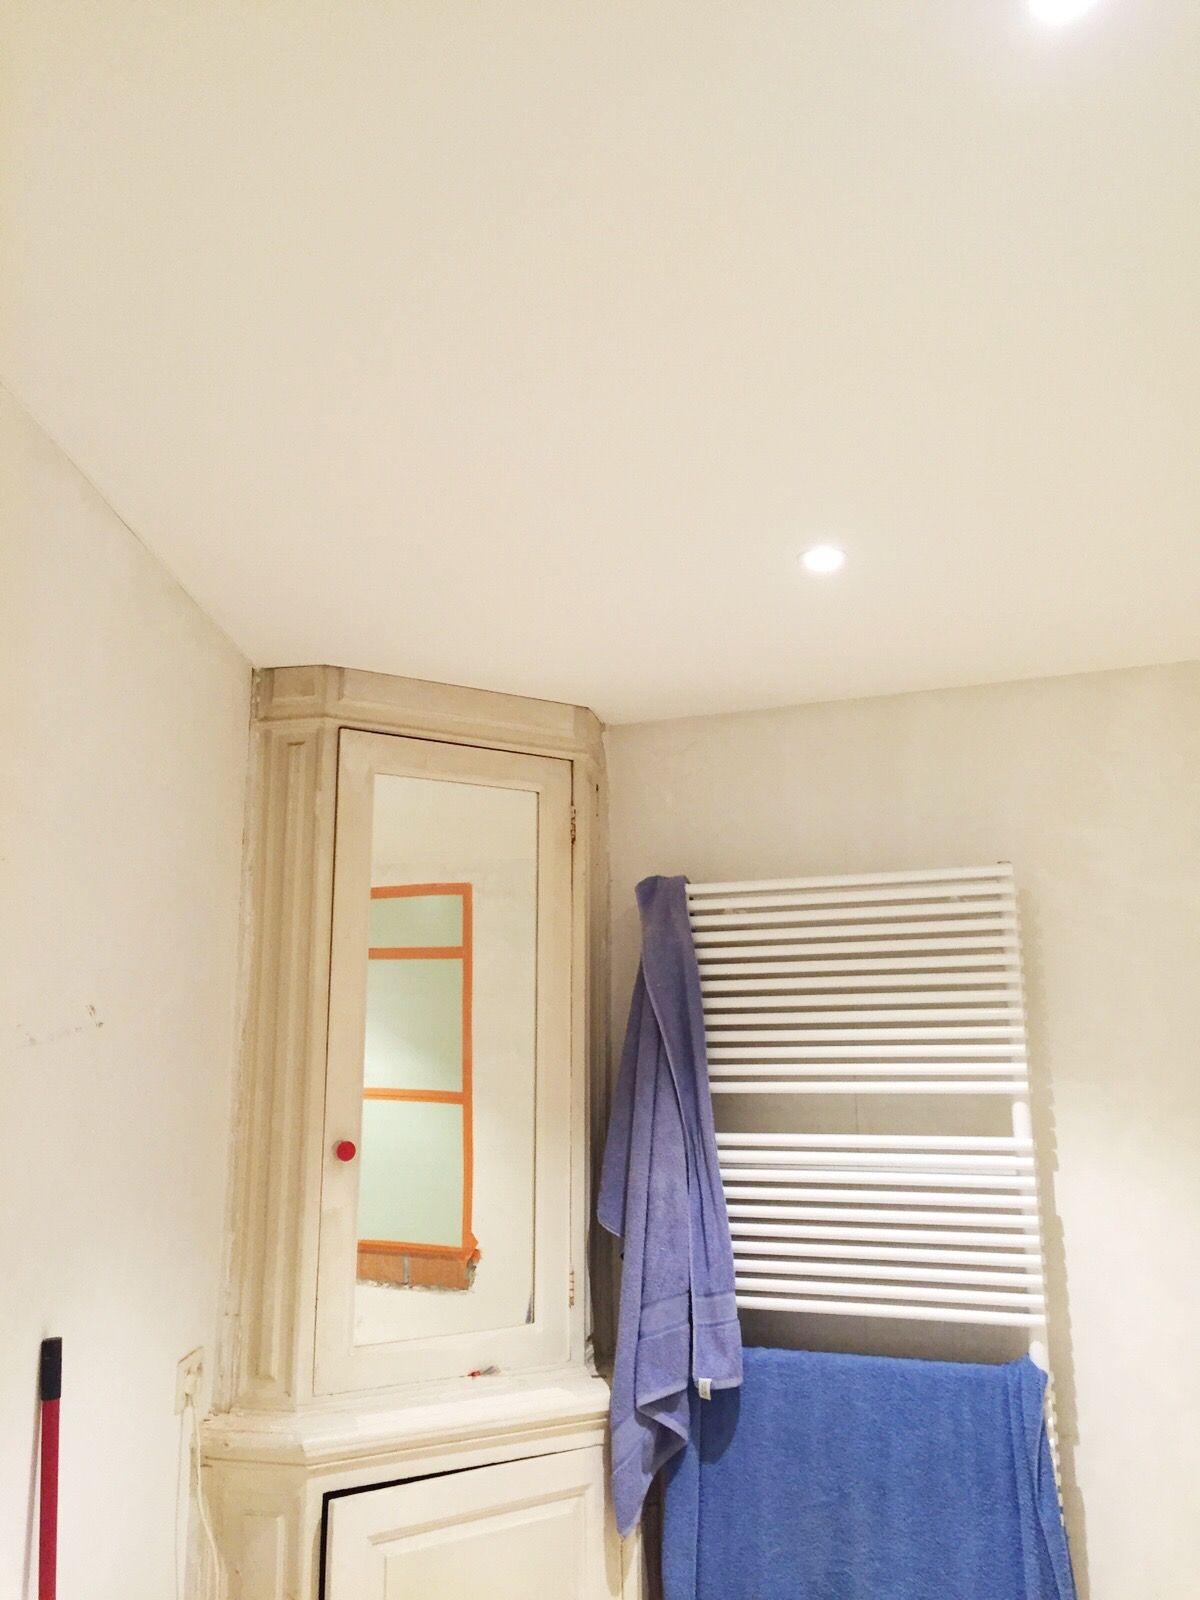 Renovatie van plafond. Nieuw spanplafond in badkamer te Berchem ...